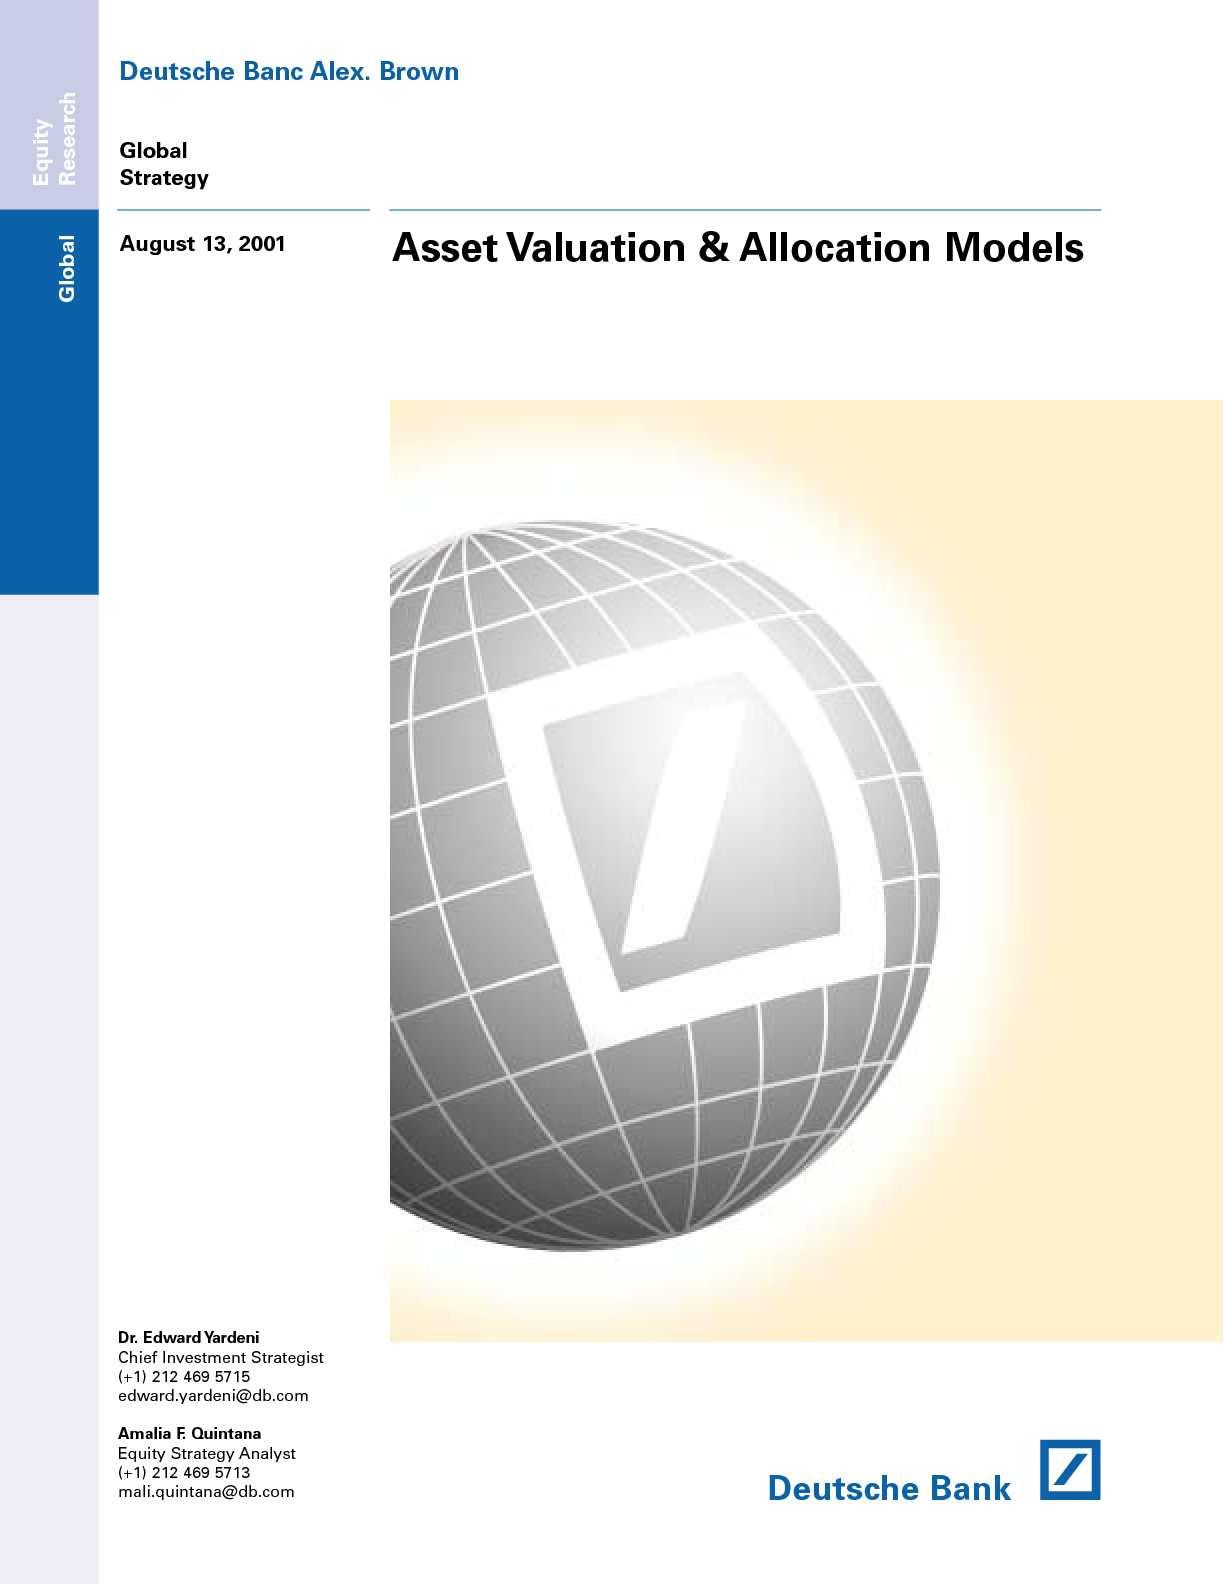 Asset Valuation & Allocation